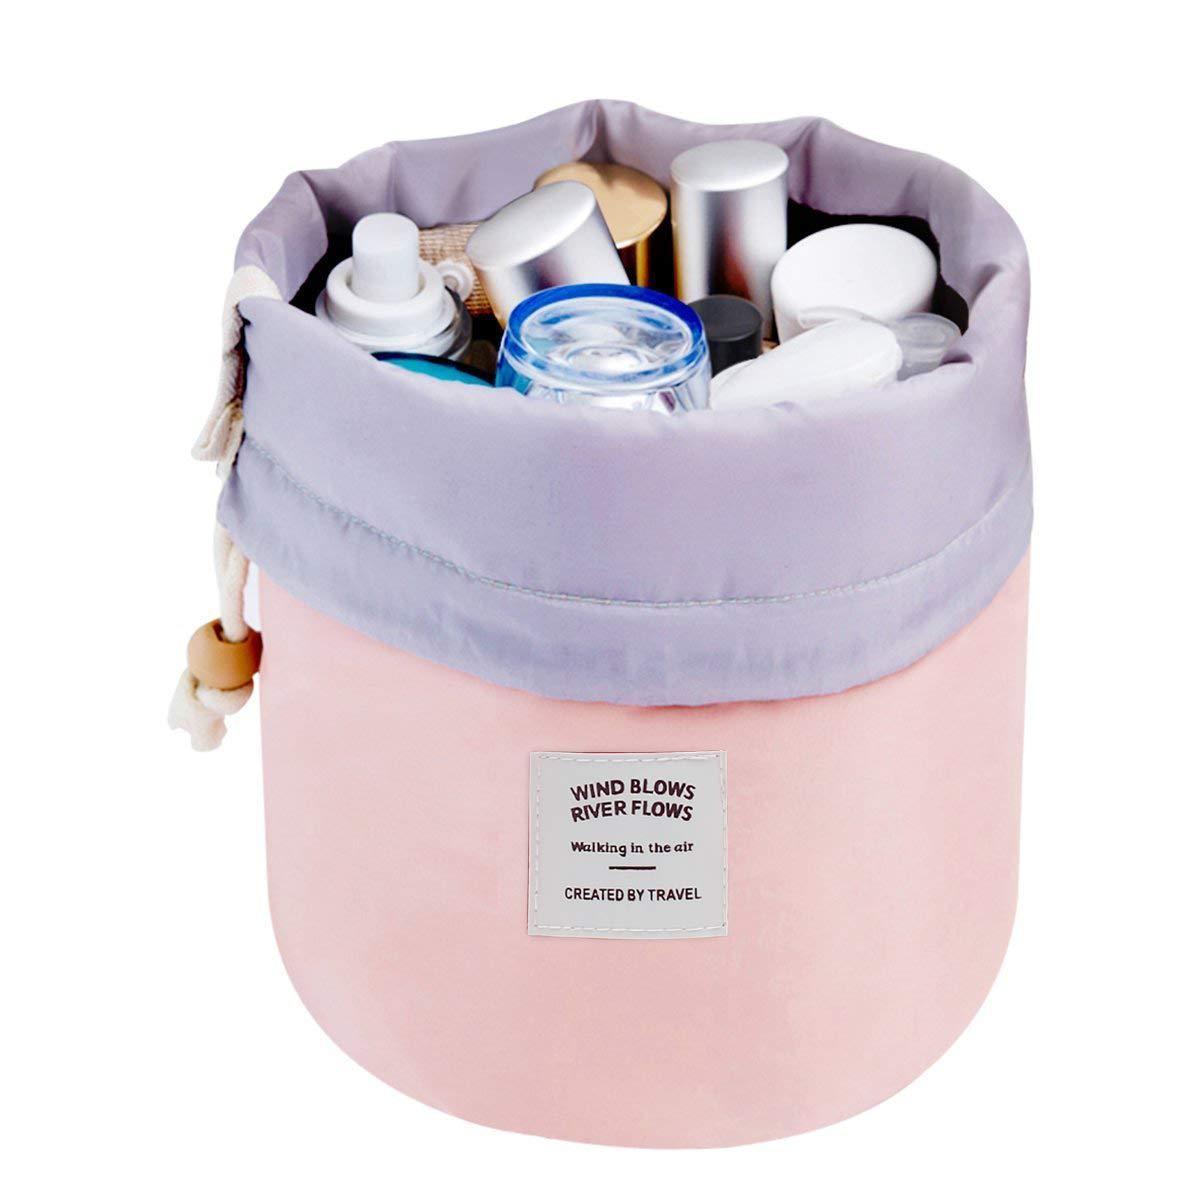 2a43f0abc1e0 Mermaid Travel Cosmetic Bag Travel Makeup Bag Organizer Women Girls Barrel  Shaped Hanging Toiletry Wash Bags